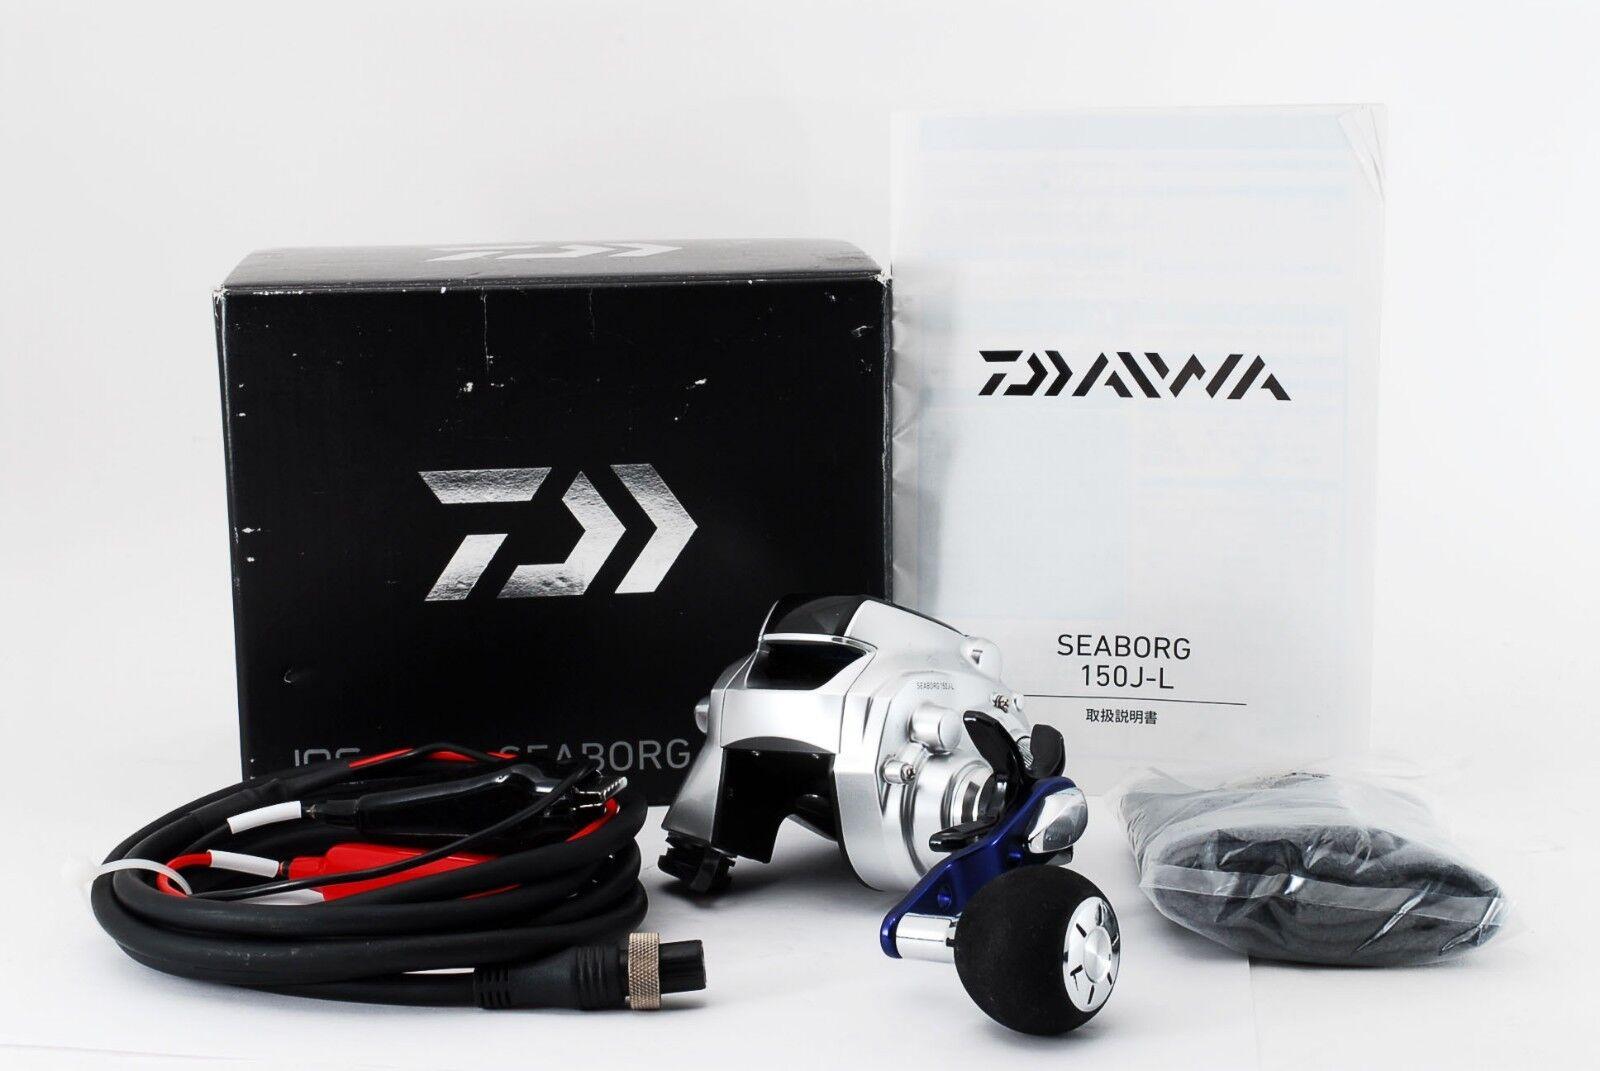 Excellent++ Daiwa Seaborg 150J-L Electric Reel 358885